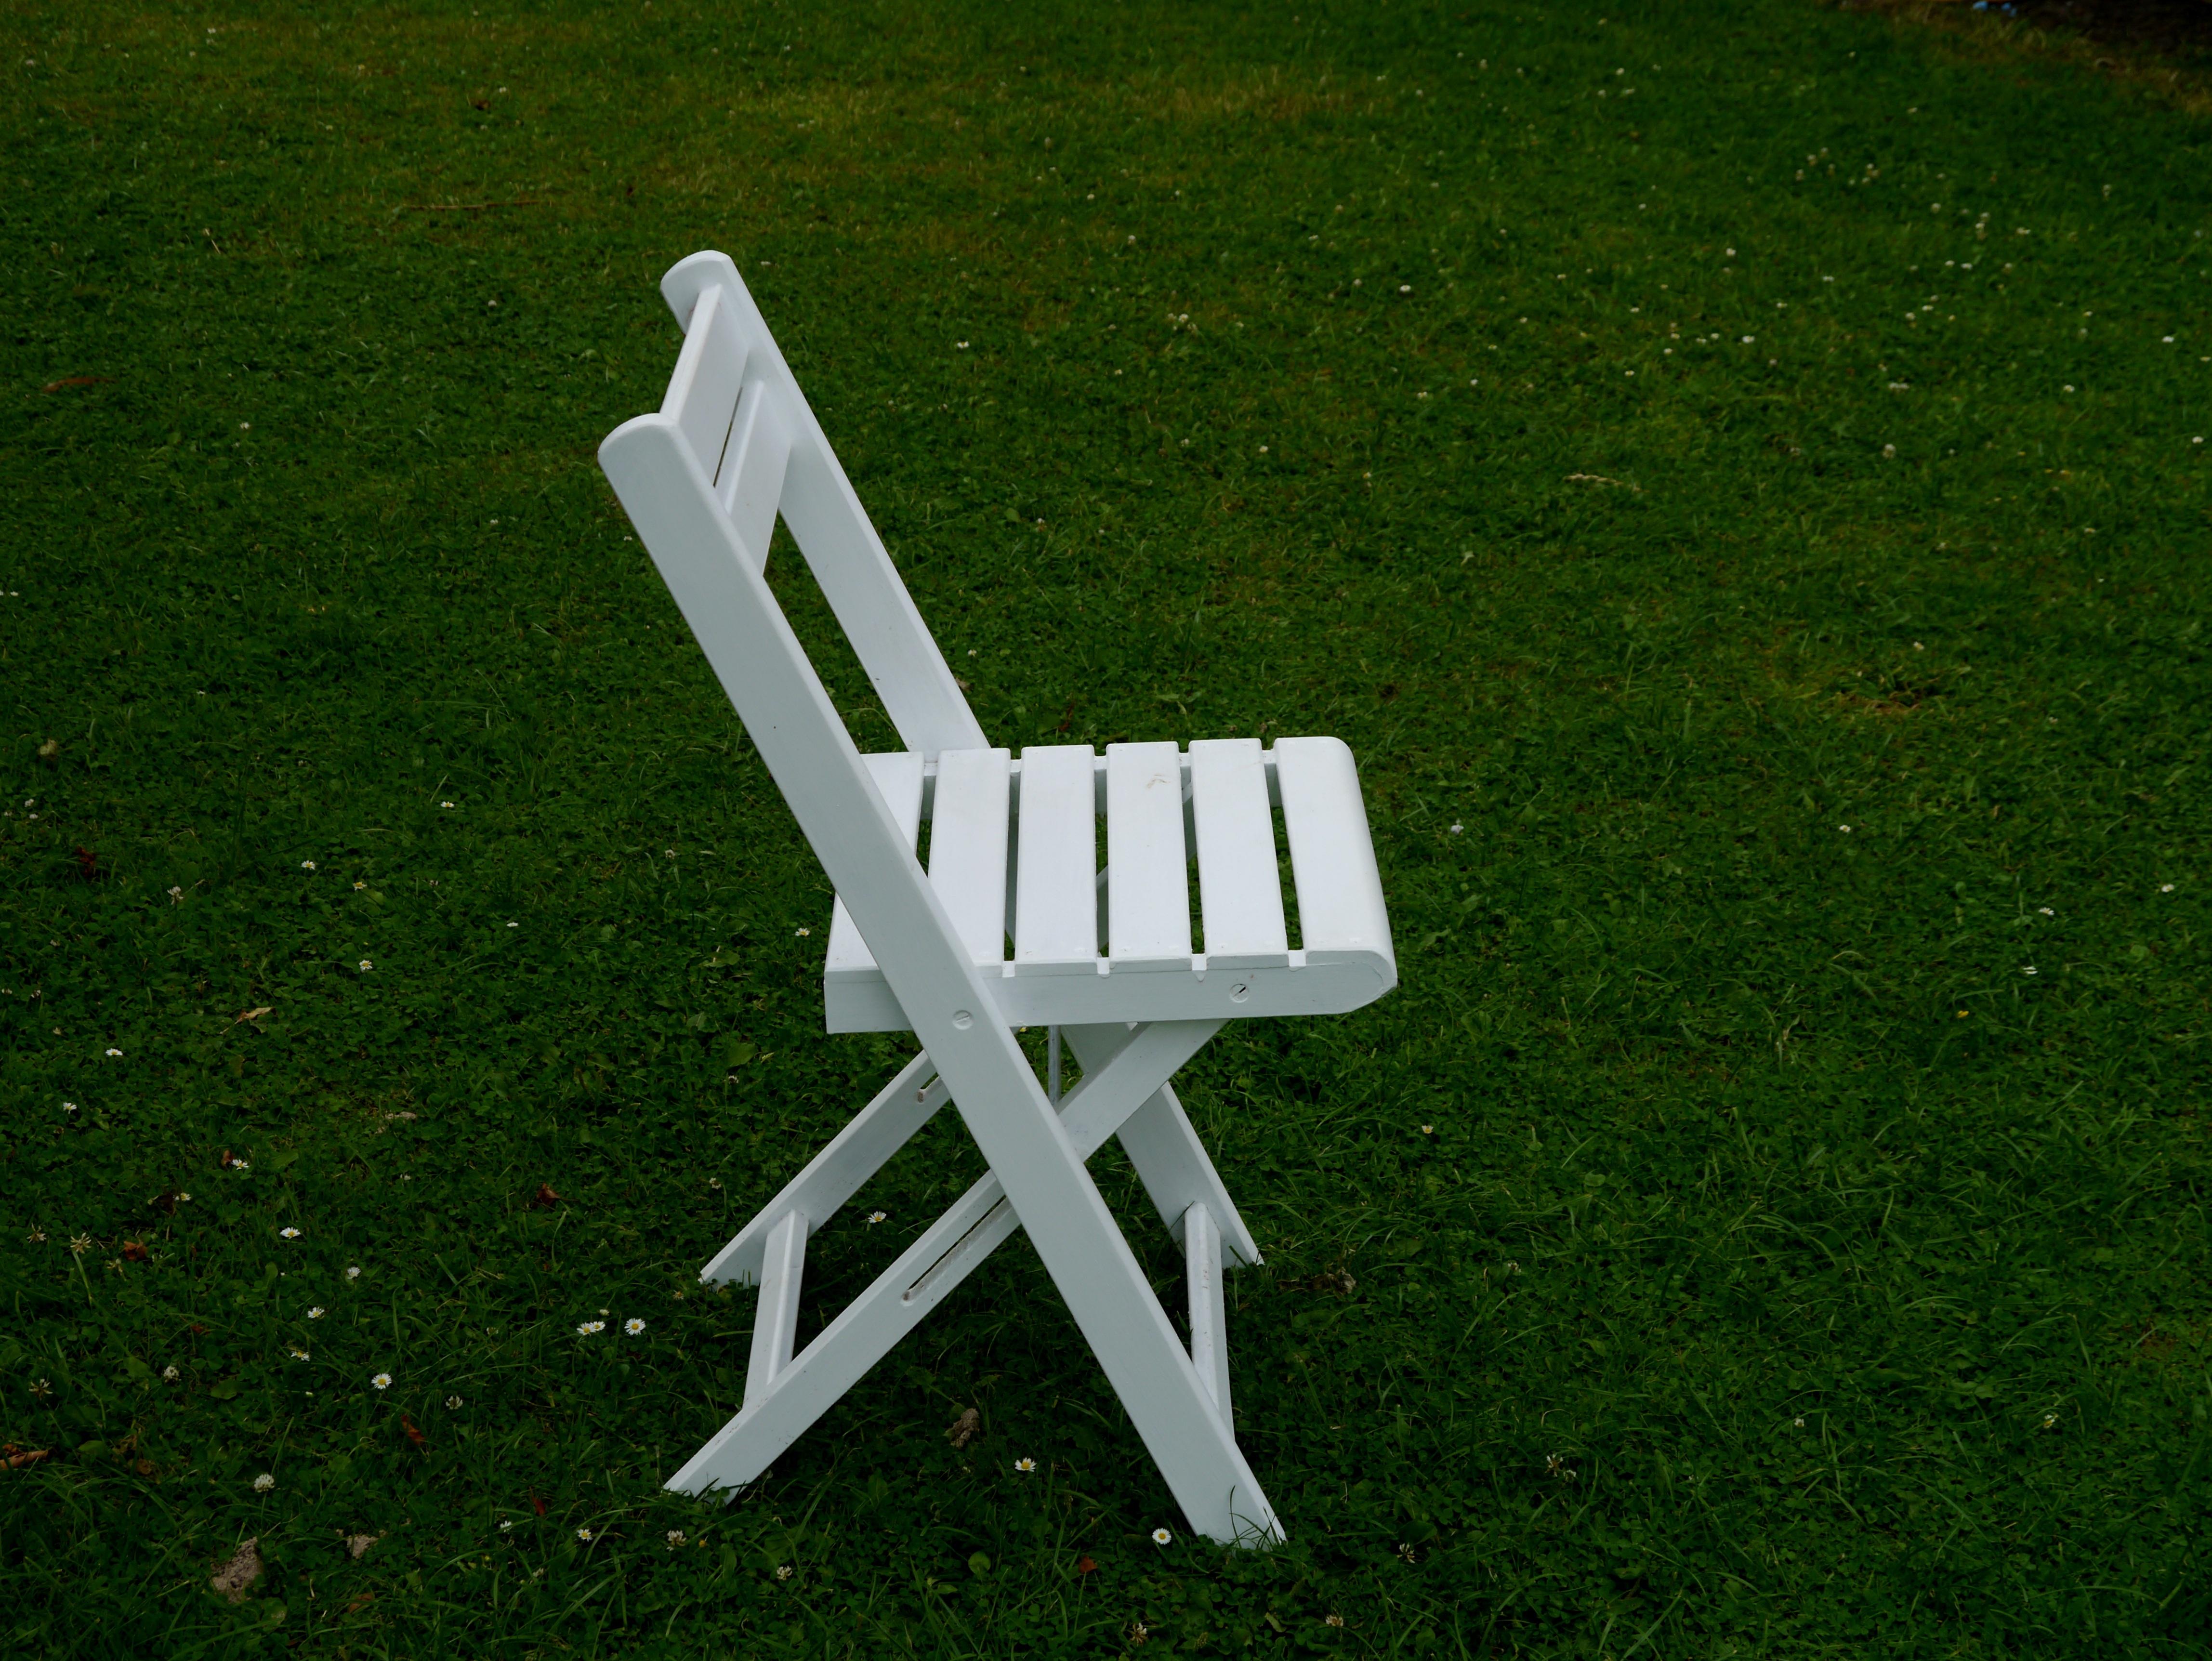 Grass Wood White Lawn Chair Number Green Furniture Garden Golf Club Shape  Flooring Garden Chair